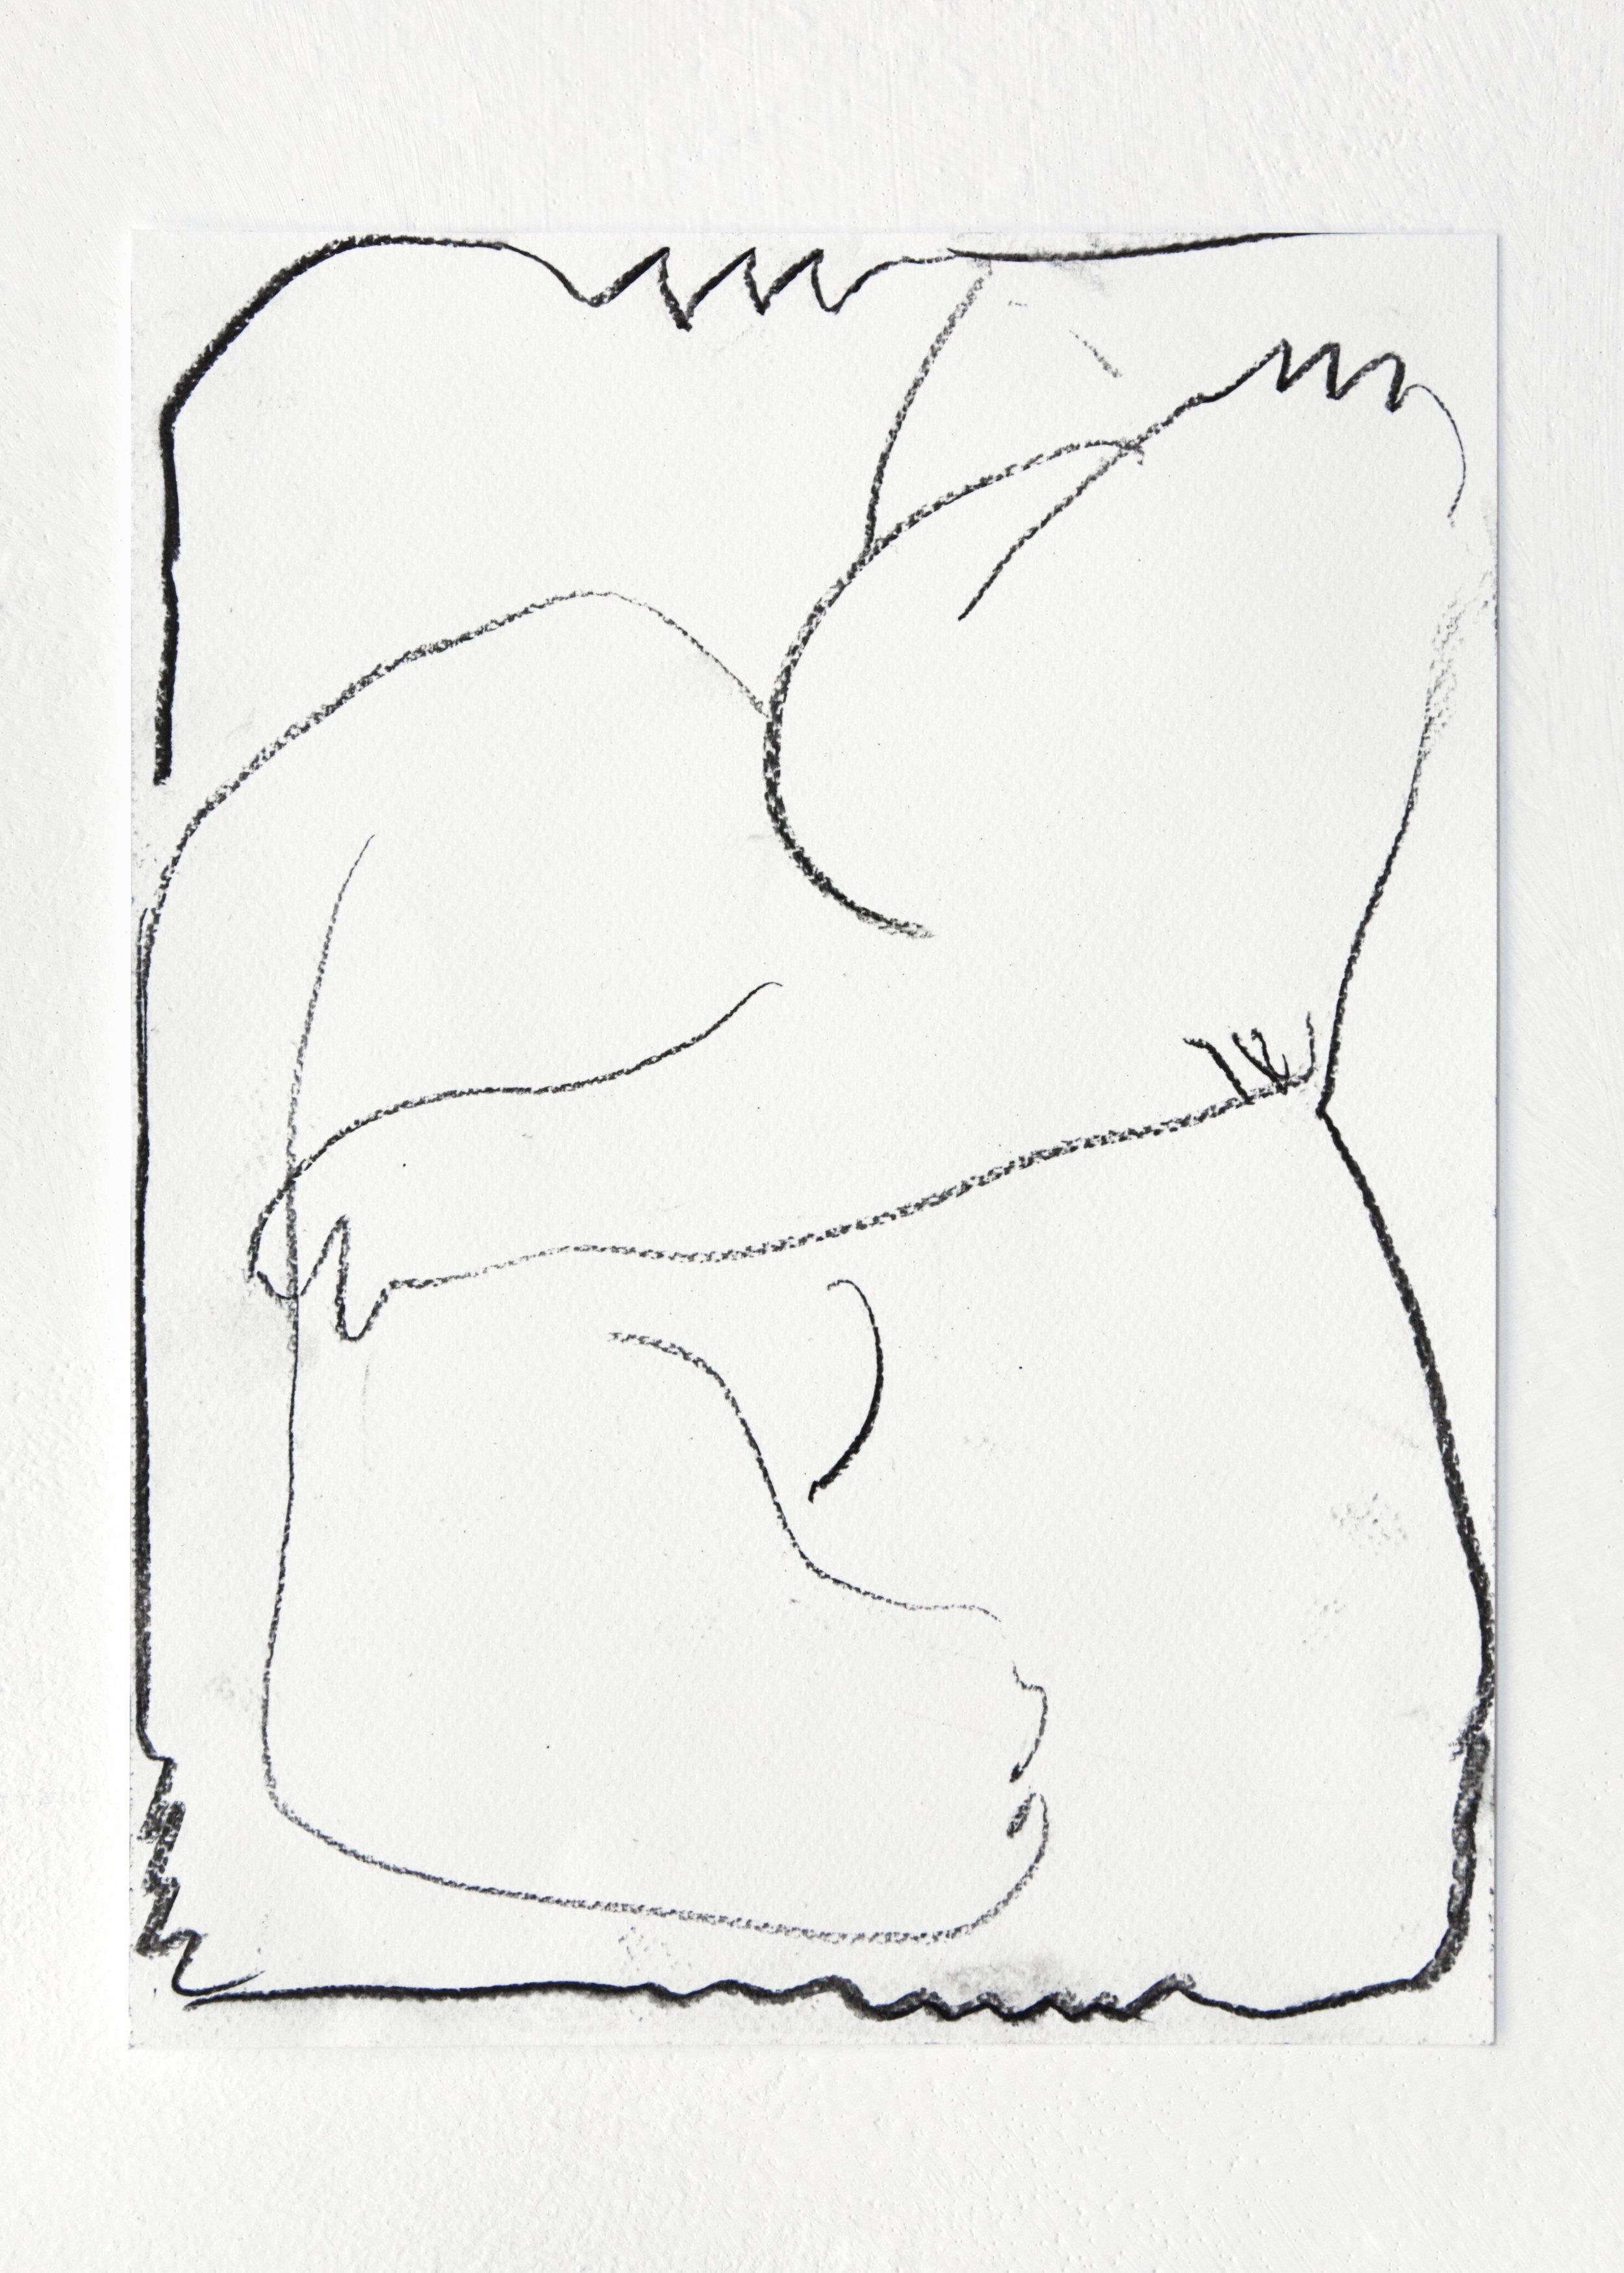 4eva   2019  Charcoal on watercolour paper  24 x 32 cm